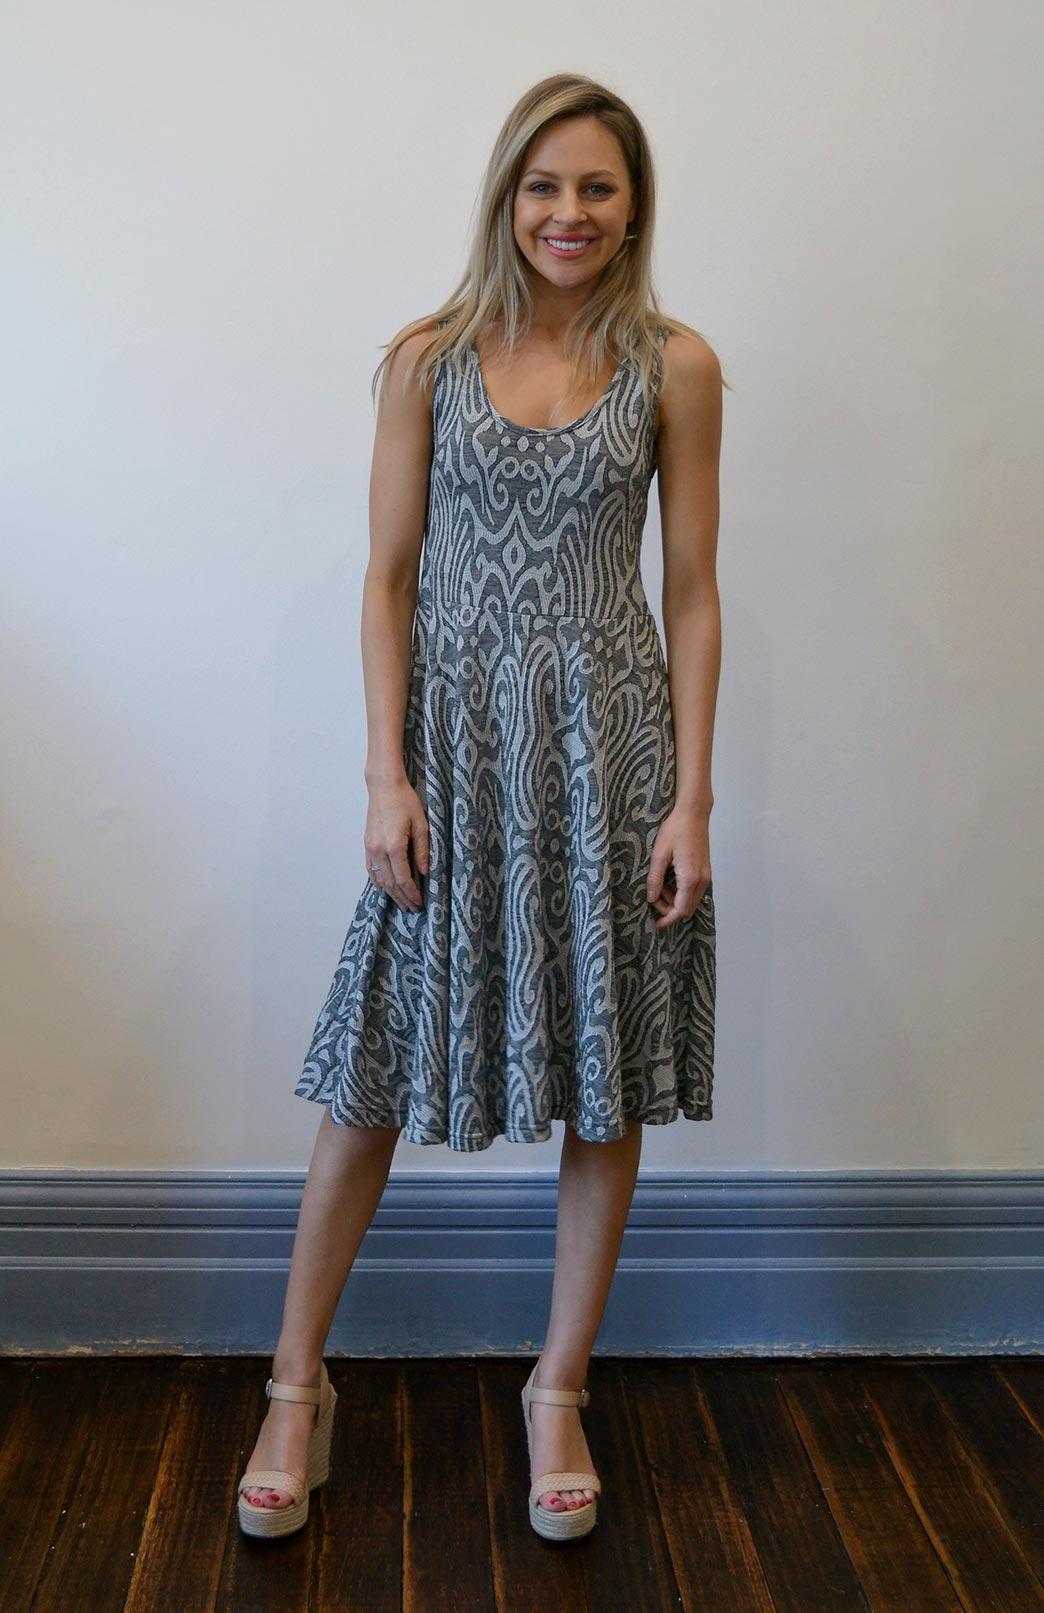 Sleeveless Jackie Dress | Women's Merino Wool Patterned Sleeveless Summer Dress | Smitten Merino Tasmania Australia